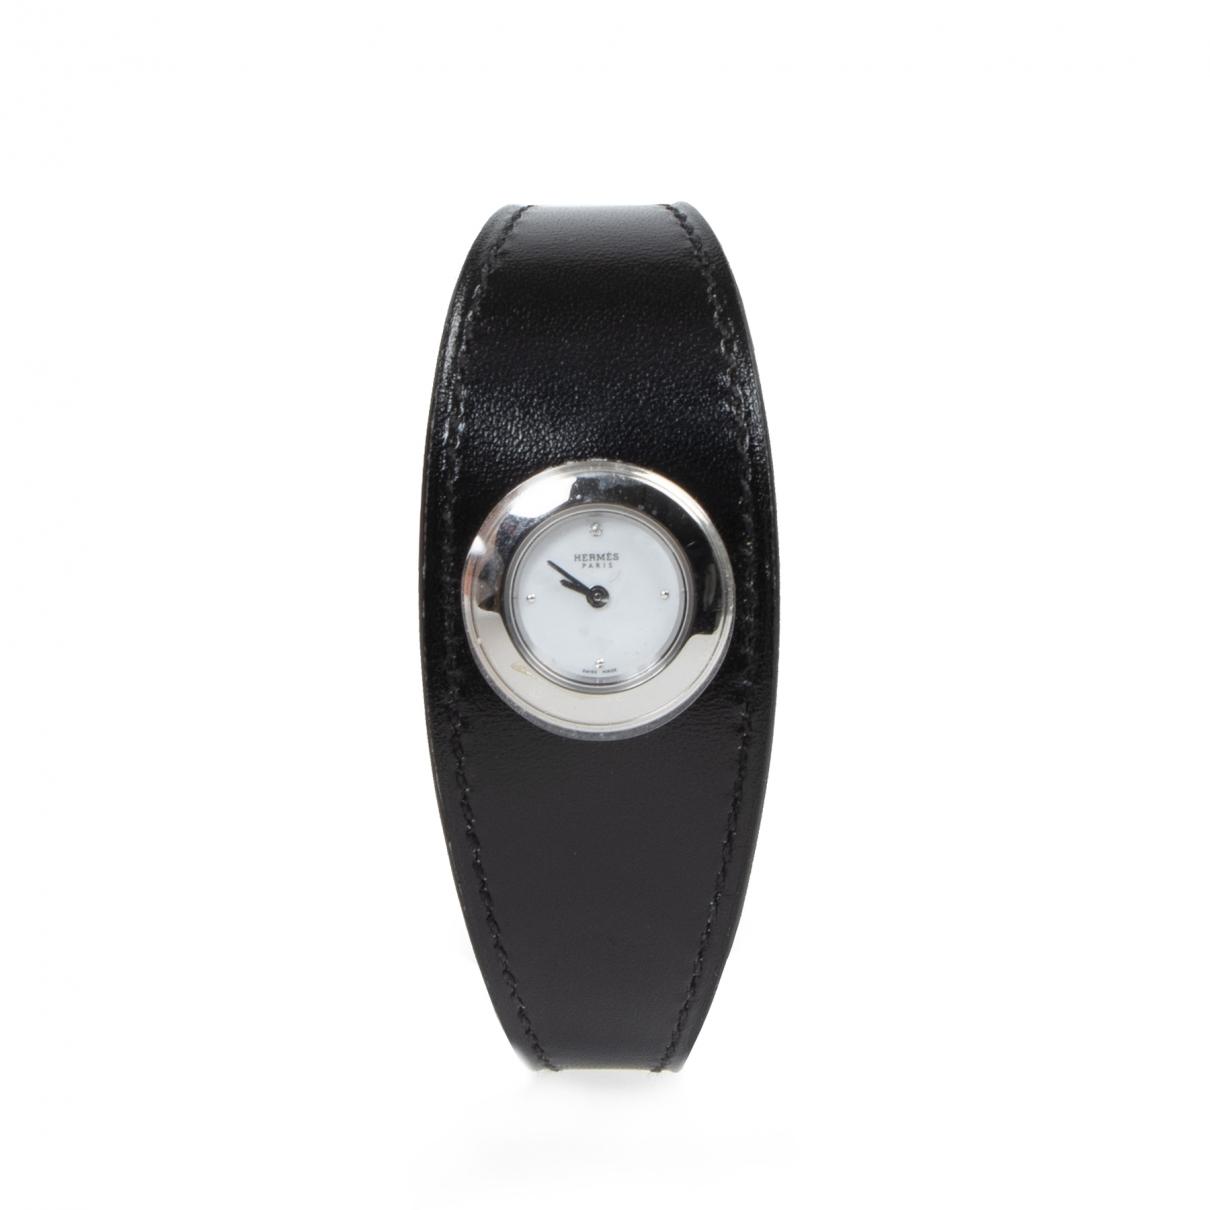 Reloj Harnais Hermes